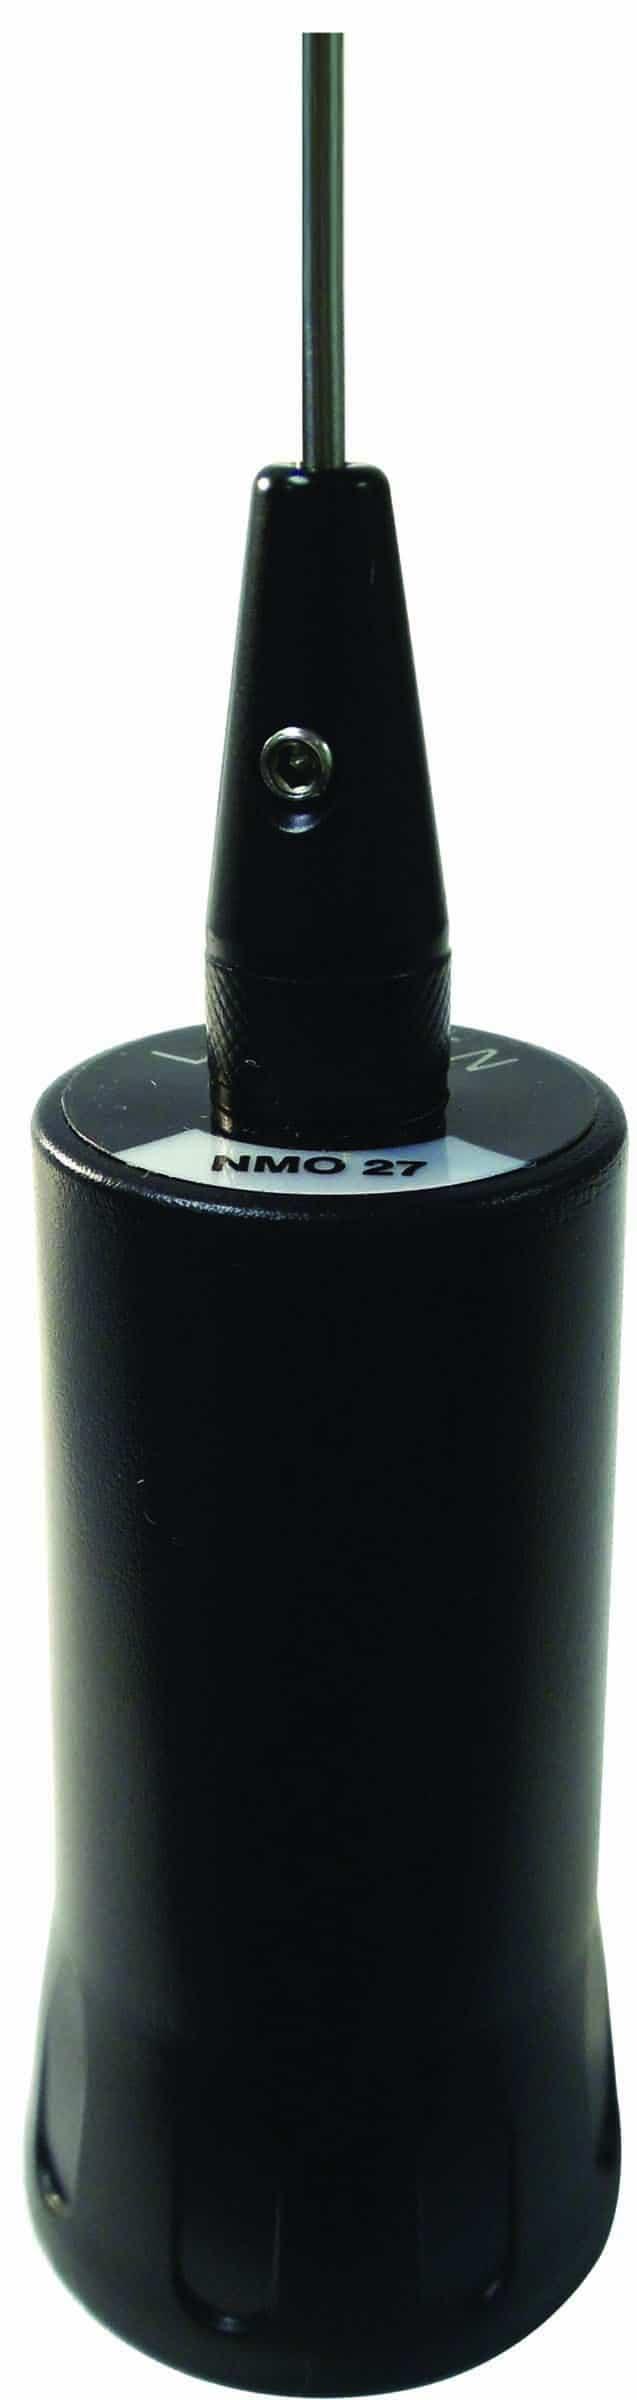 "NMO27 - Larsen NMO 52"" CB Antenna 1/4 Wave"